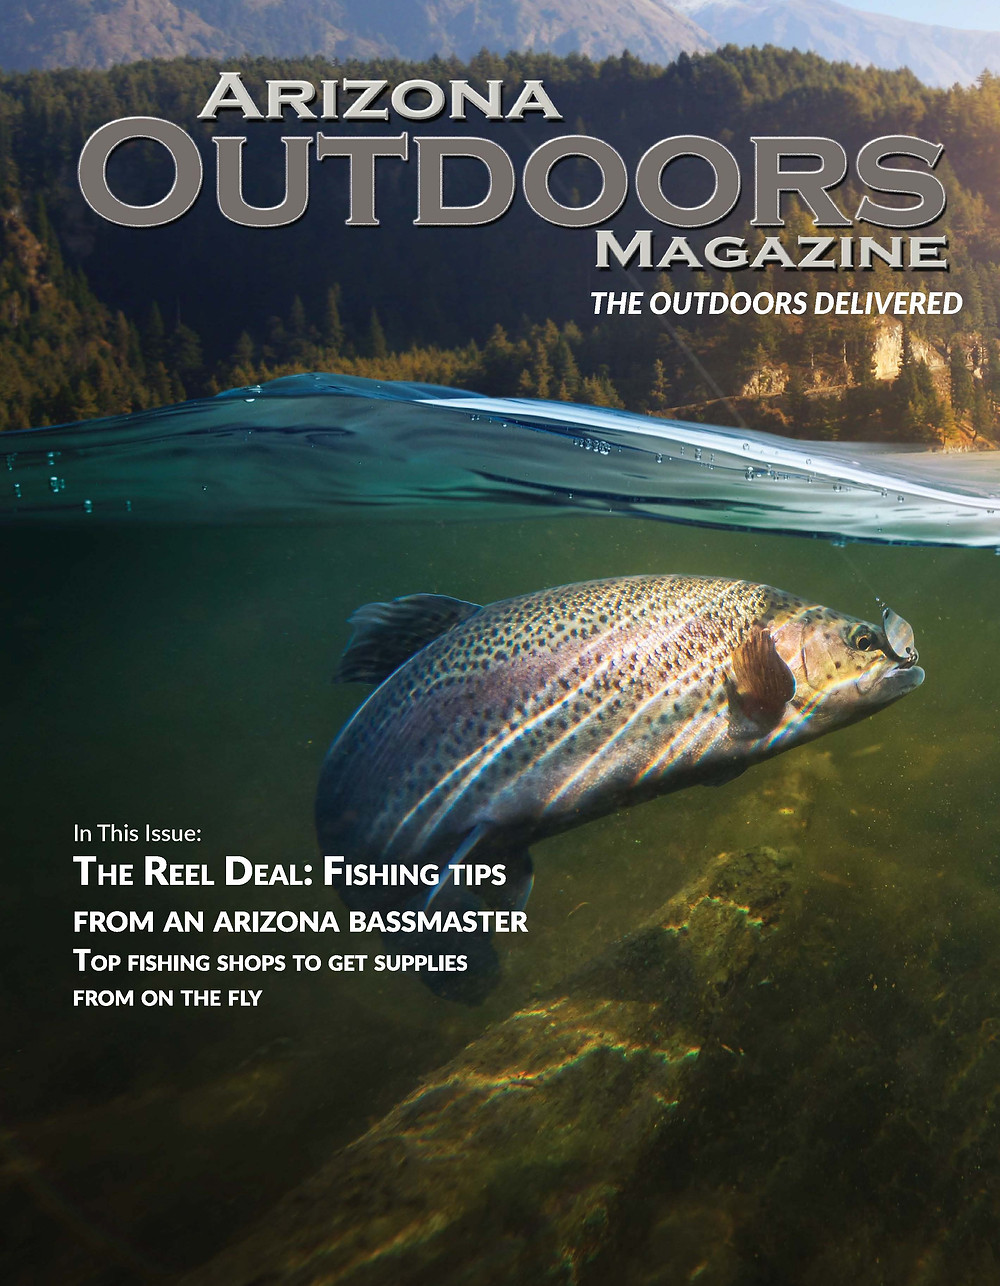 Arizona Outdoors Magazine